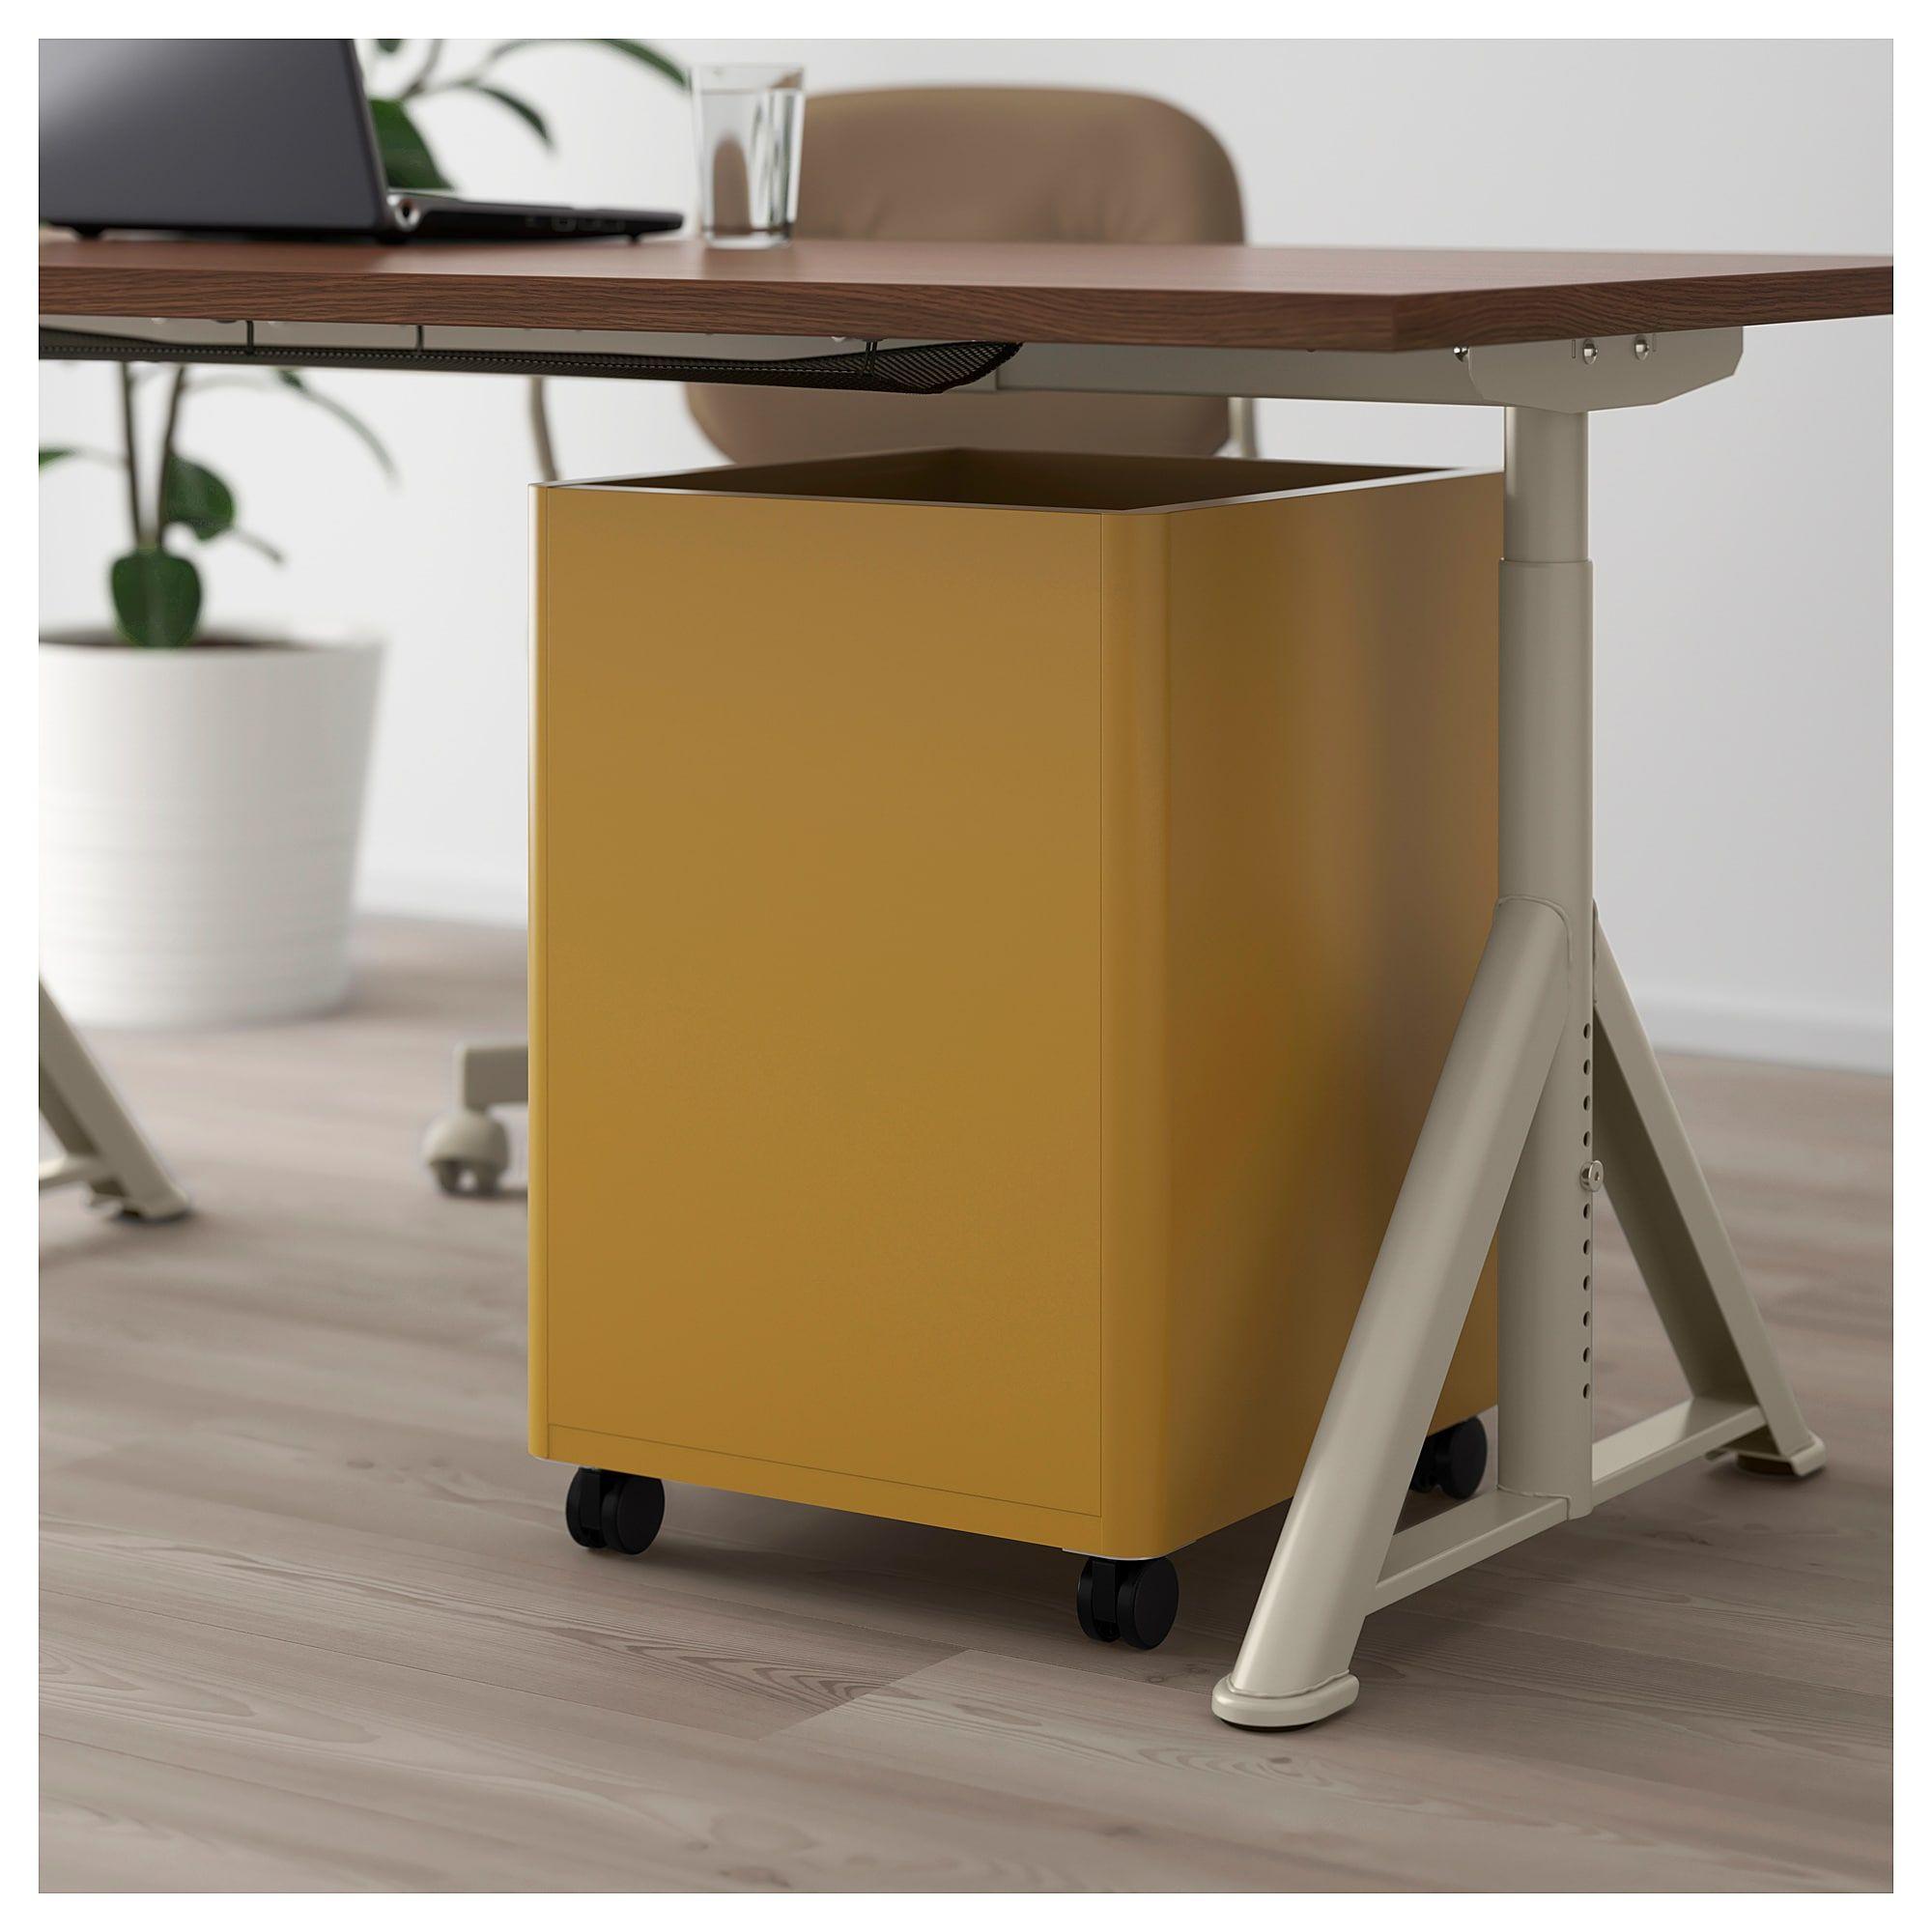 IDÅSEN Drawer unit with smart lock golden brown 16 1